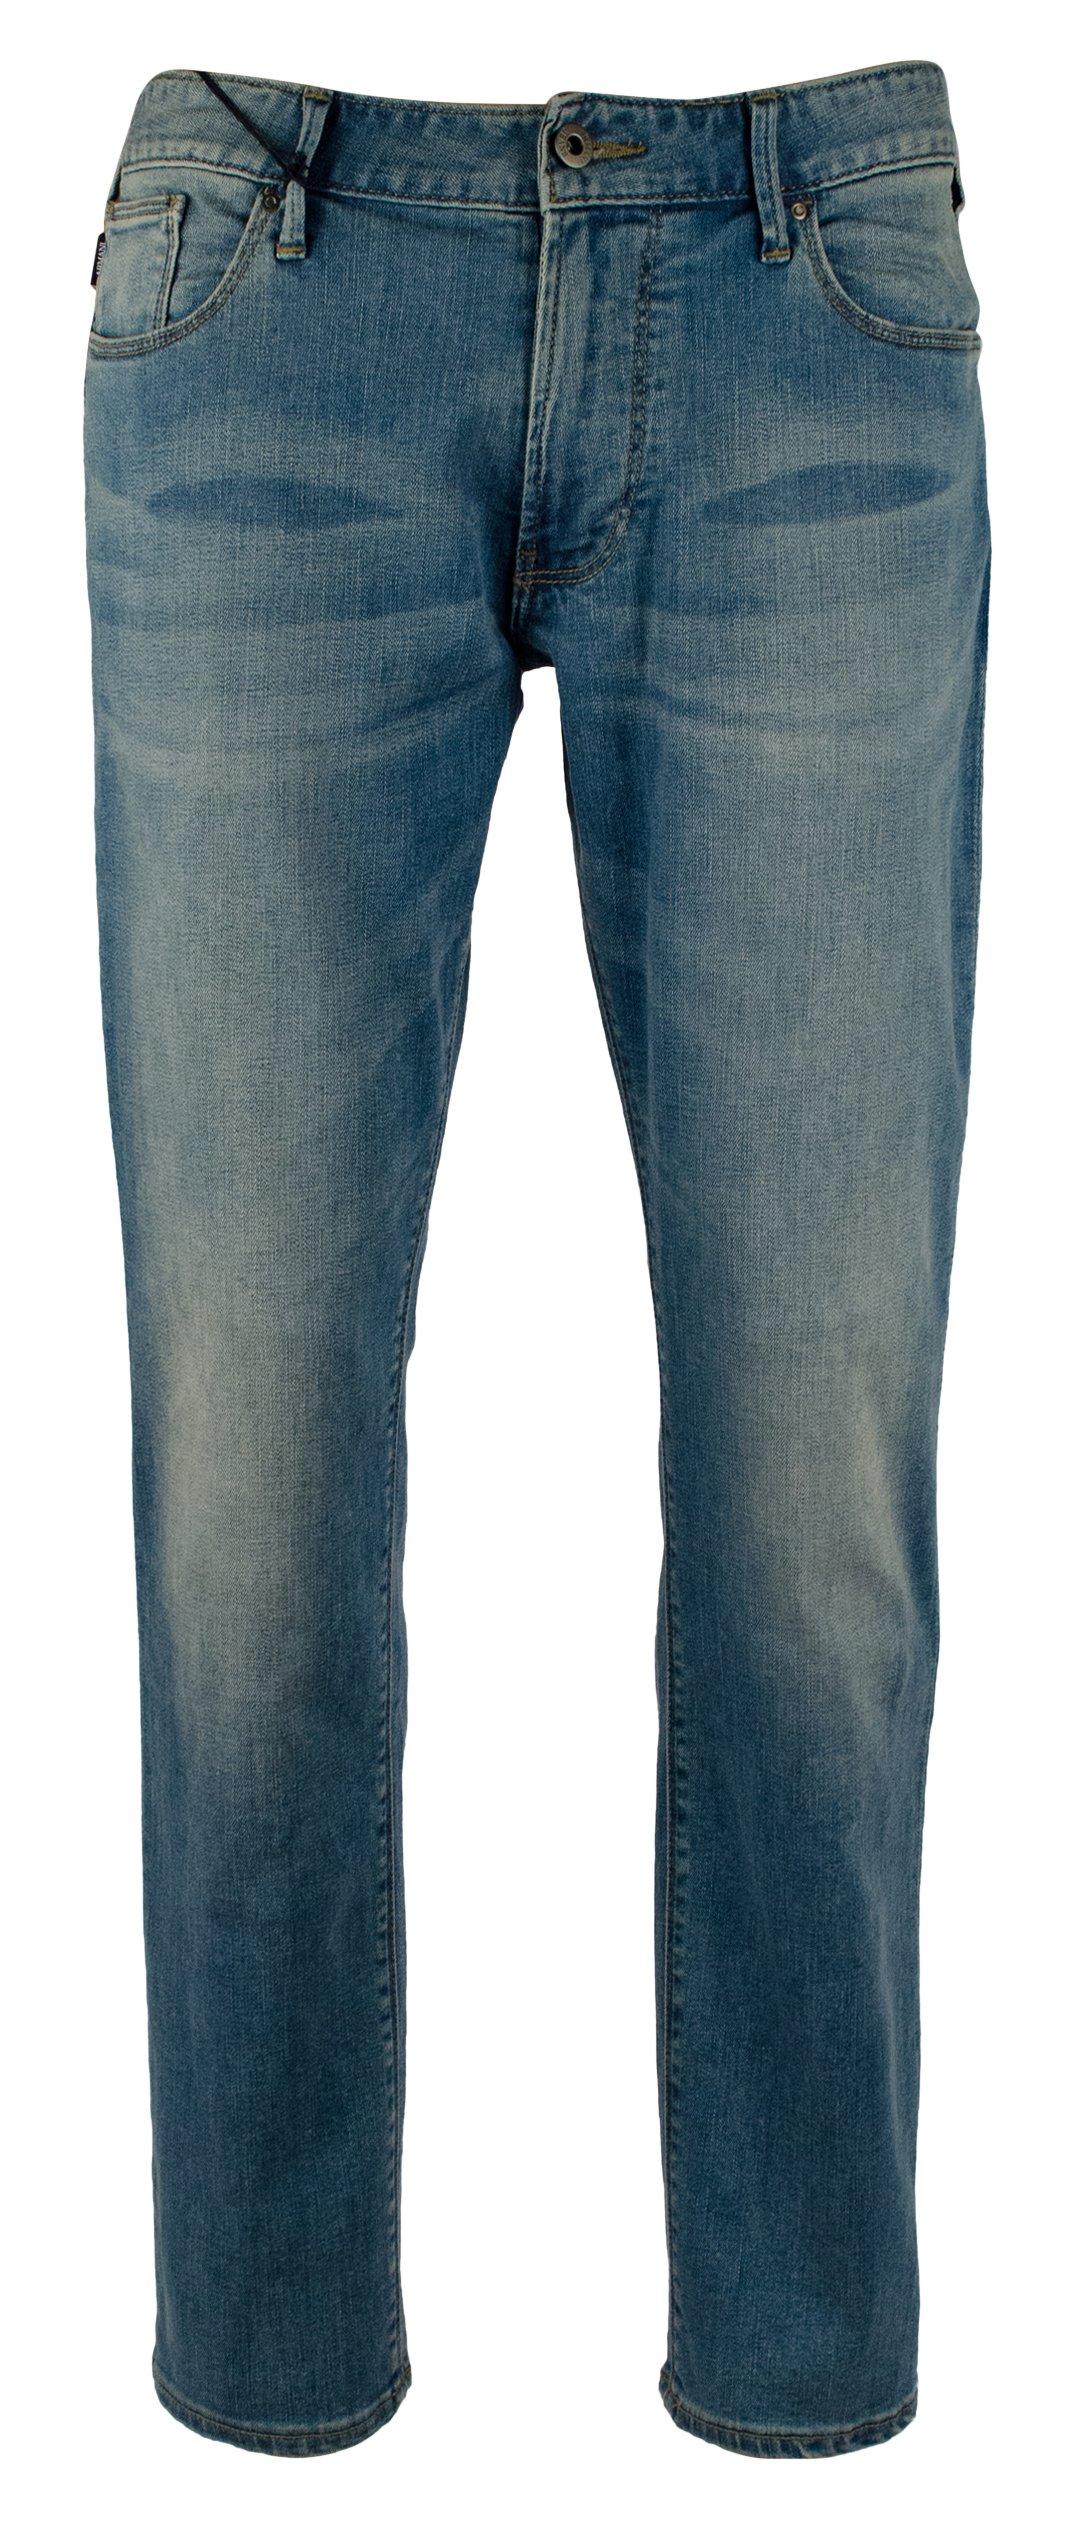 Armani Men's Slim J06 Fit Stretch Jeans Pants-B-36Wx30L by GIORGIO ARMANI